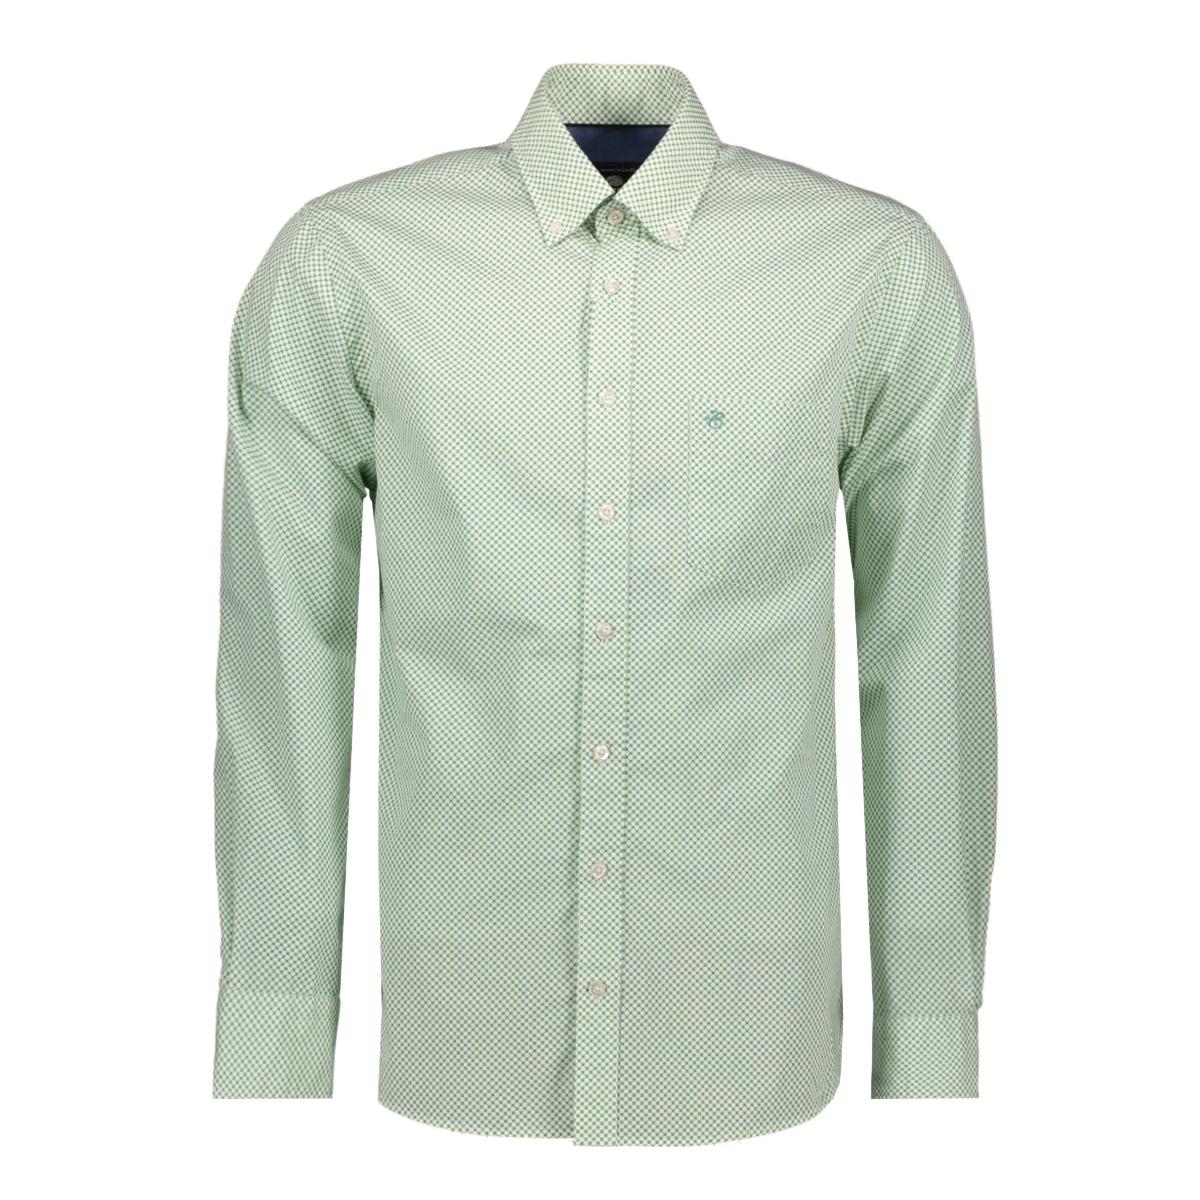 casual overhemd lm 052889 campbell overhemd 408 groen print